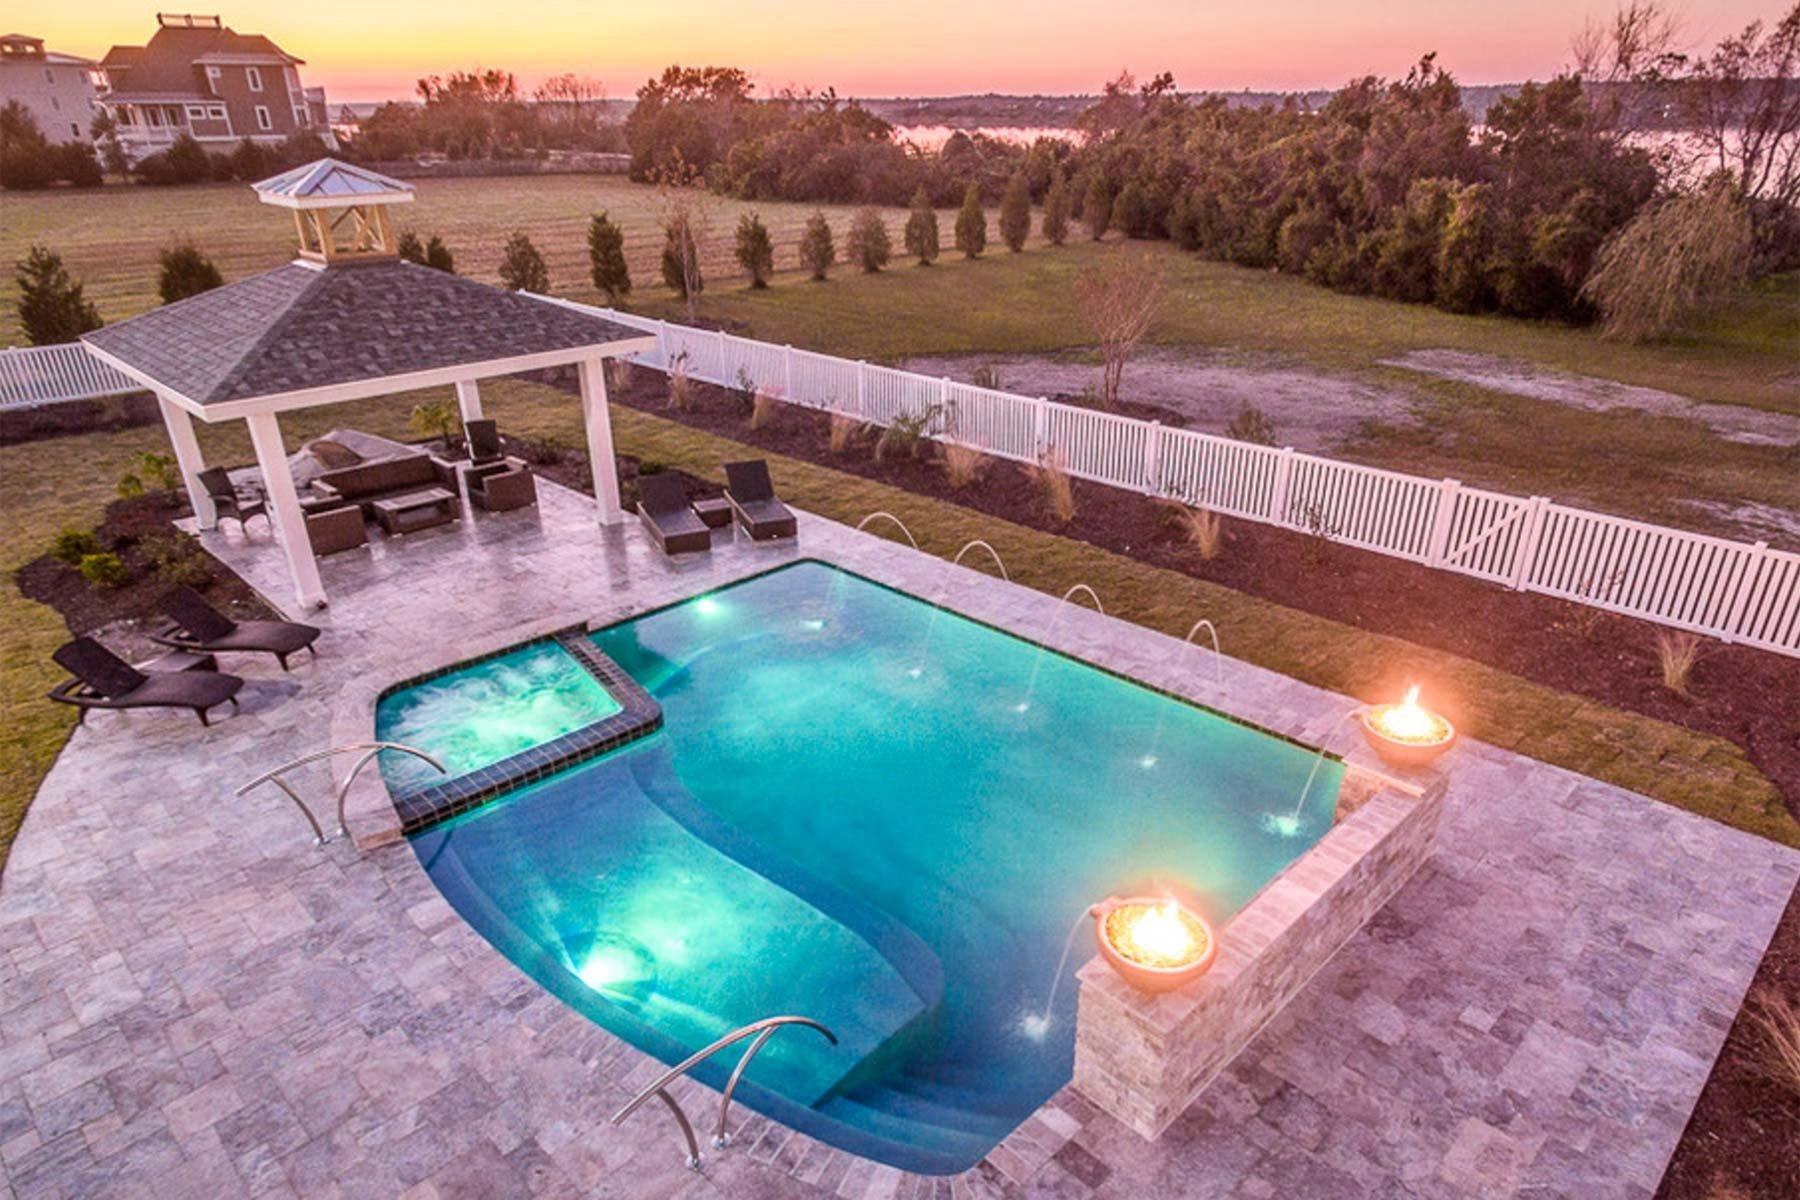 Big kahuna pools spas swimming pool builder new bern - Swimming pools with slides north west ...